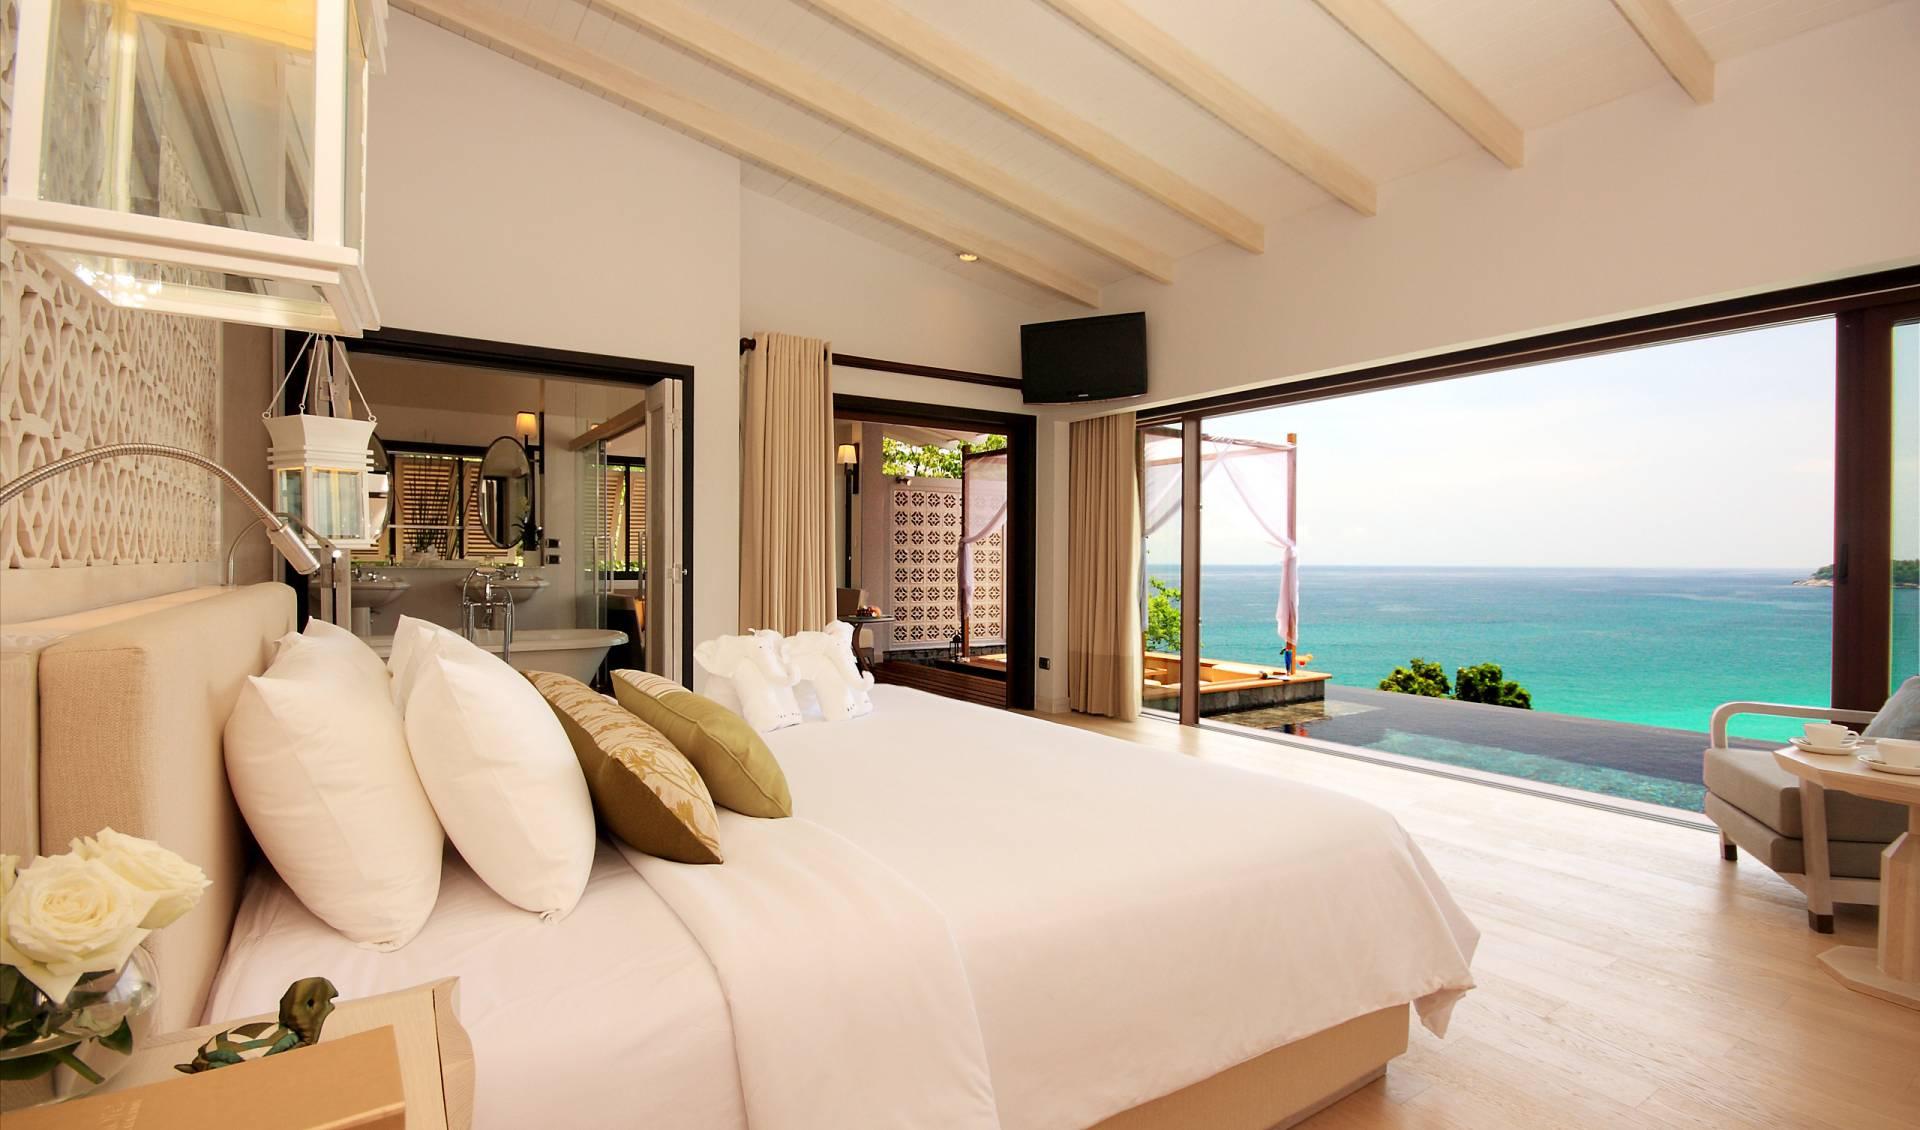 Deluxe room Что это значит twin dbl sea view with balcony перевод номер в Таиланде Турции ОАЭ Вьетнам Гоа Египте Китае и других странах